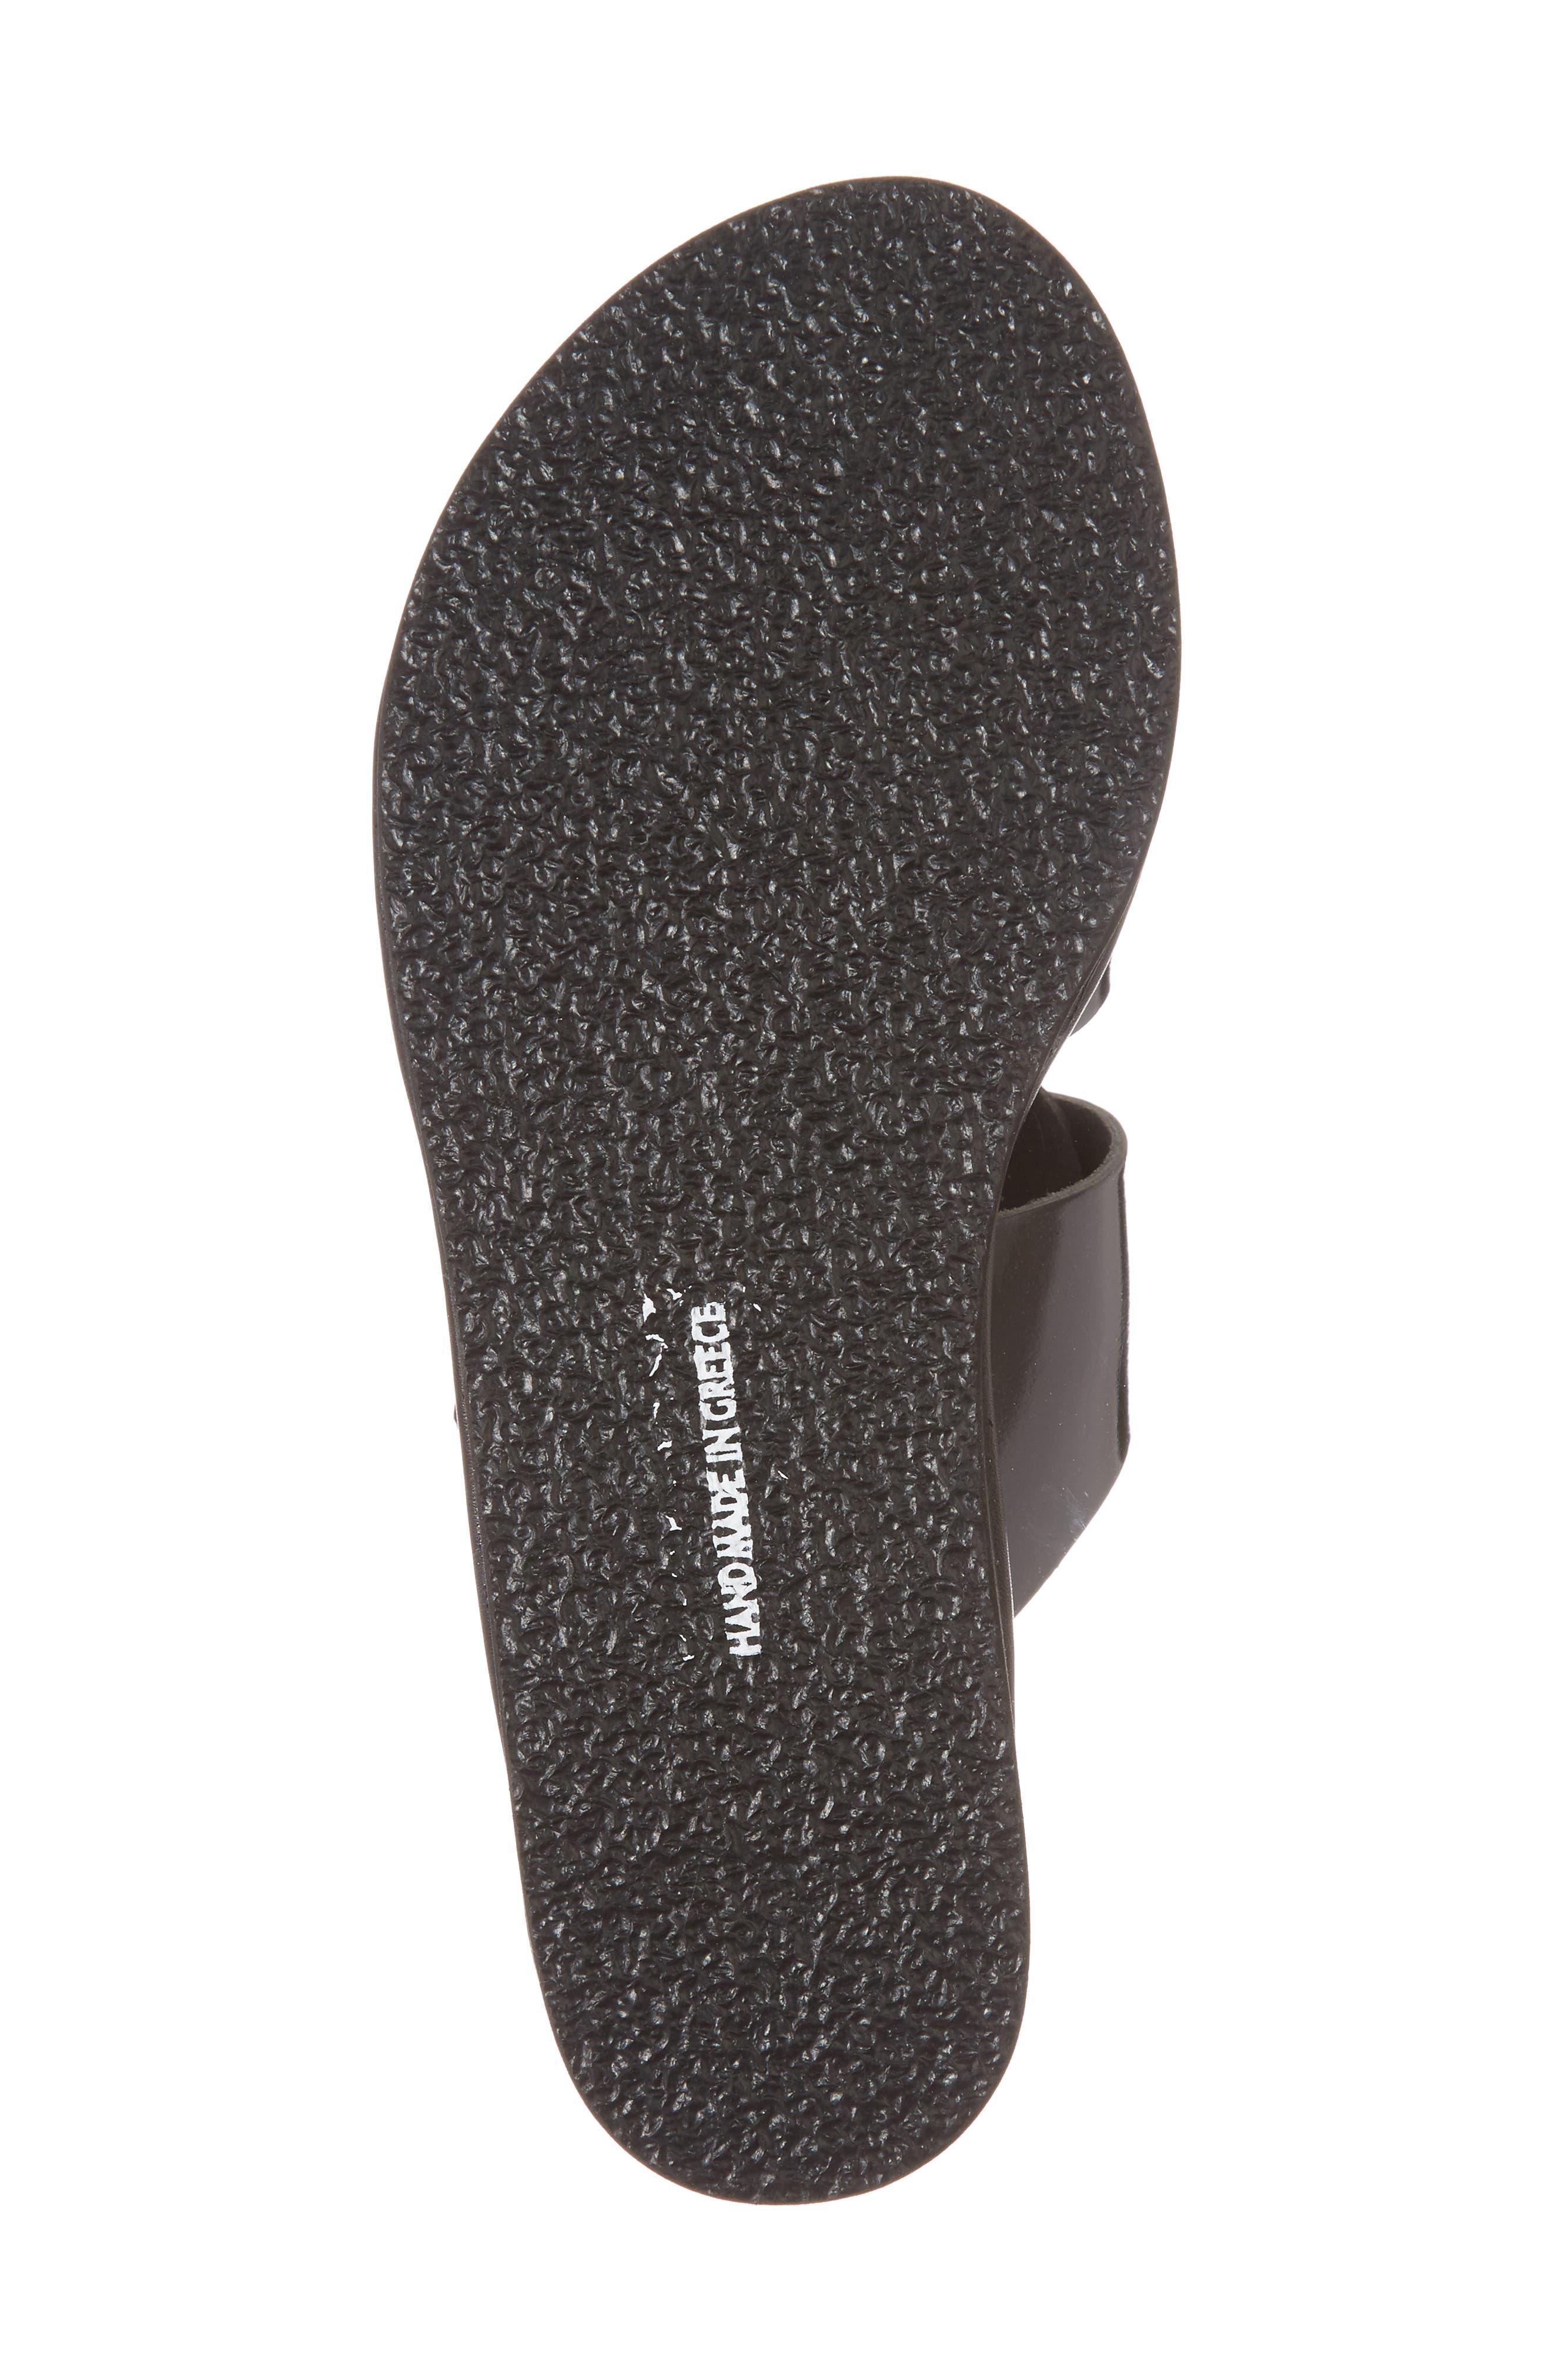 Iaso Slide Sandal,                             Alternate thumbnail 6, color,                             Black